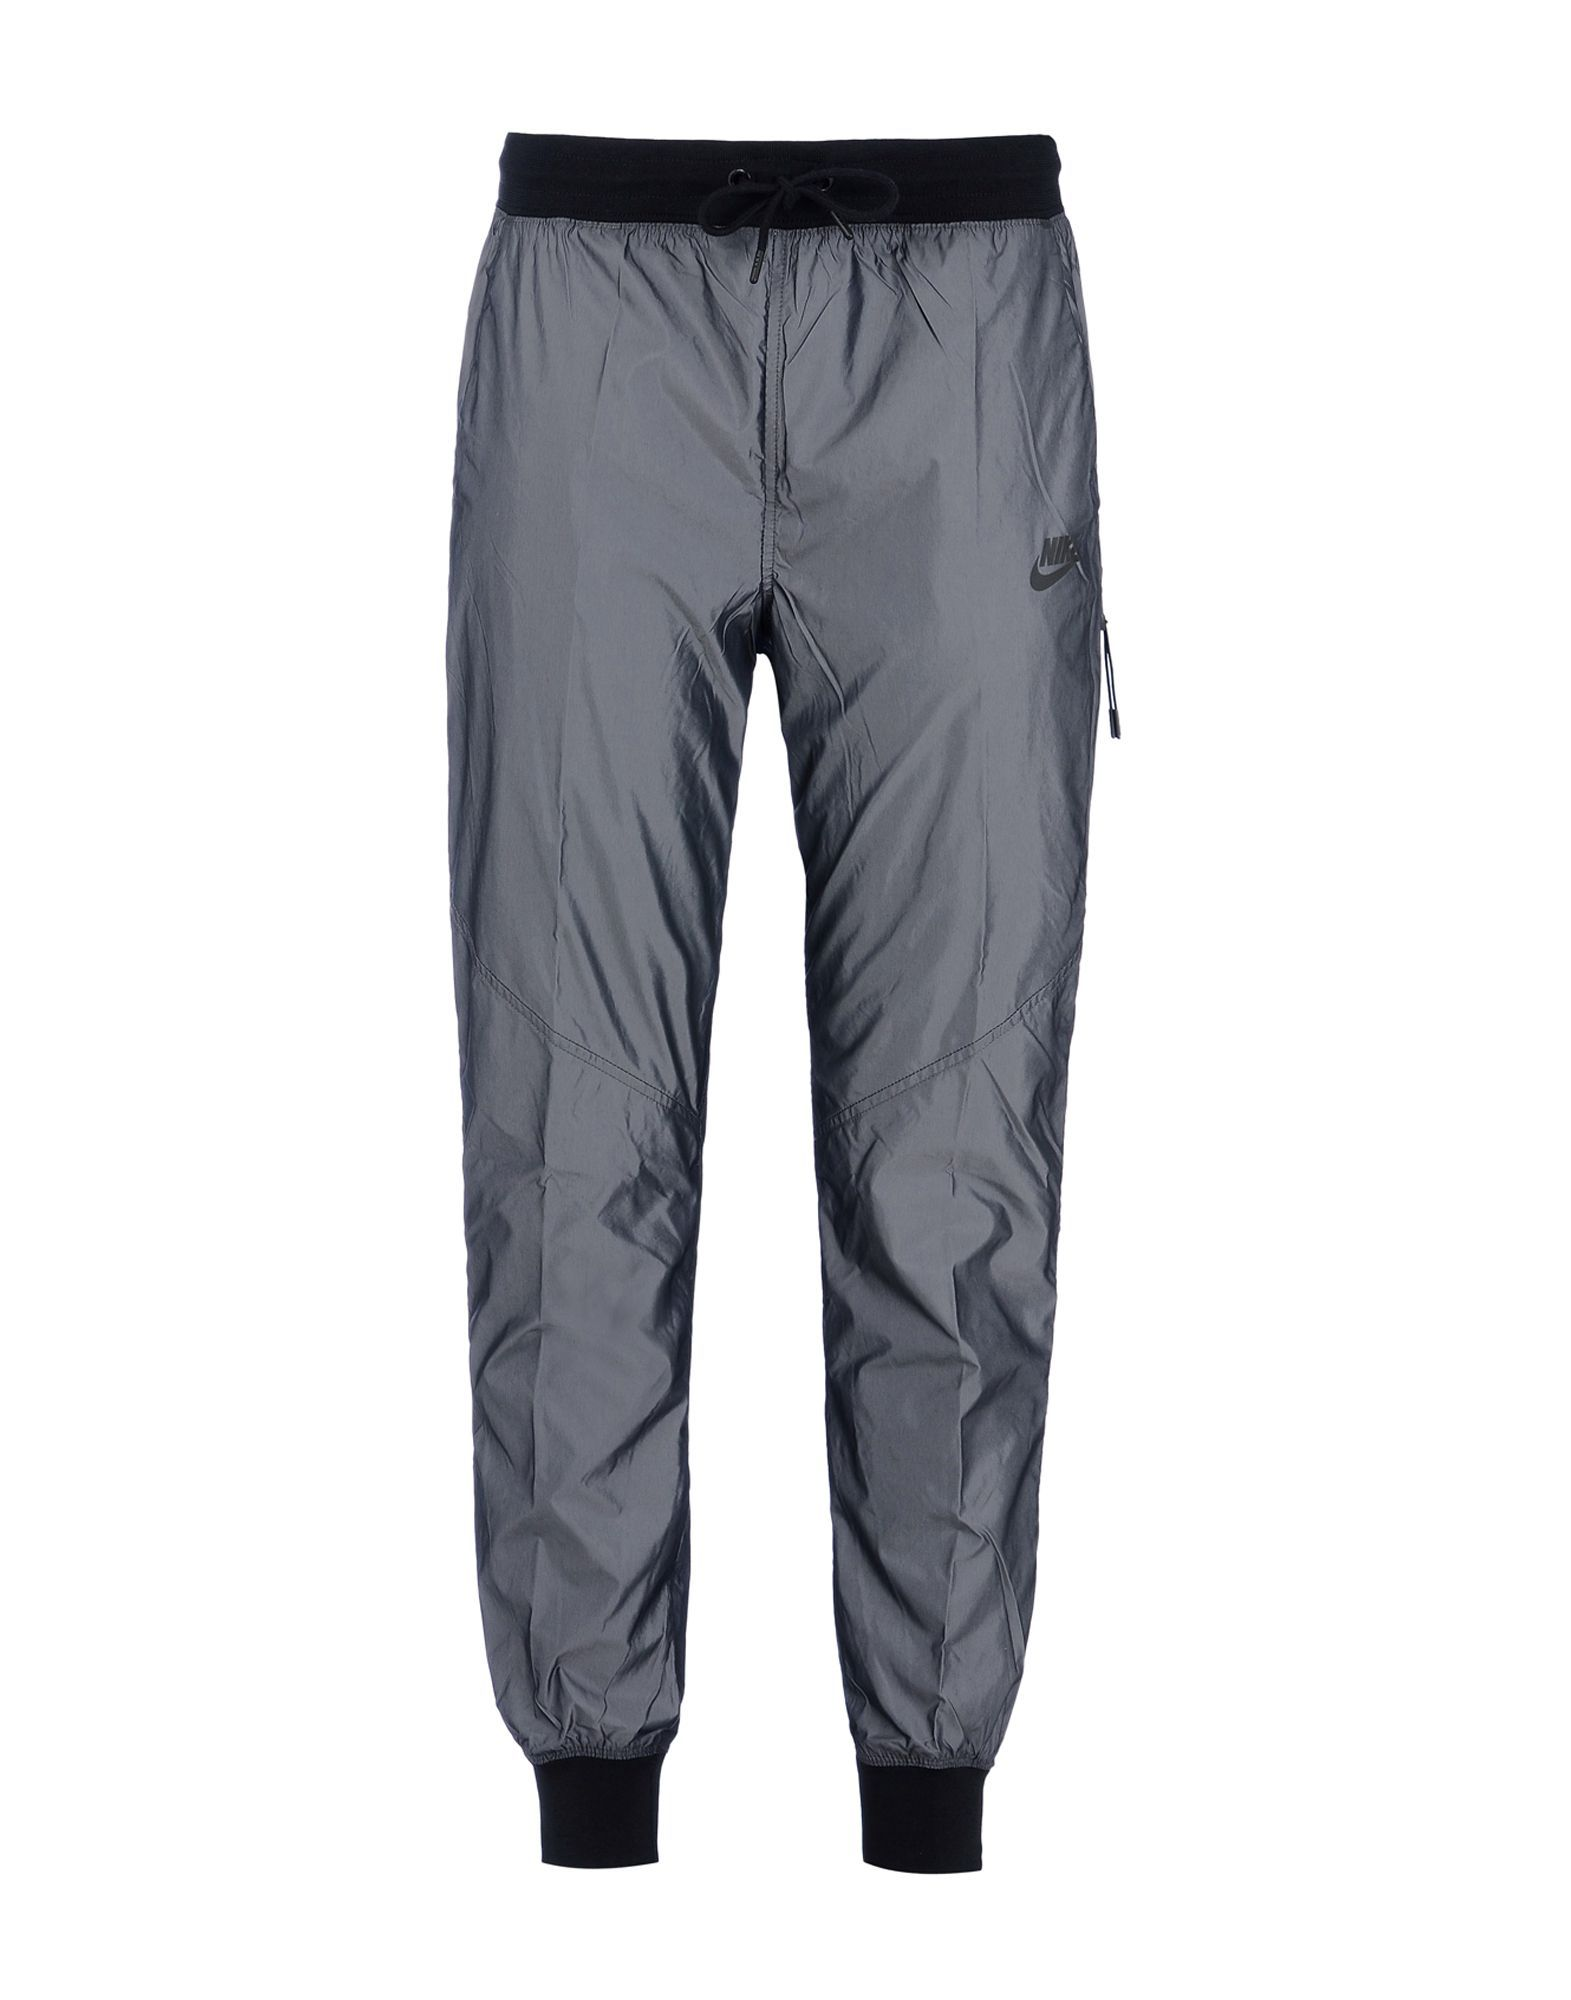 Nike Grey Techno Fabric Trousers